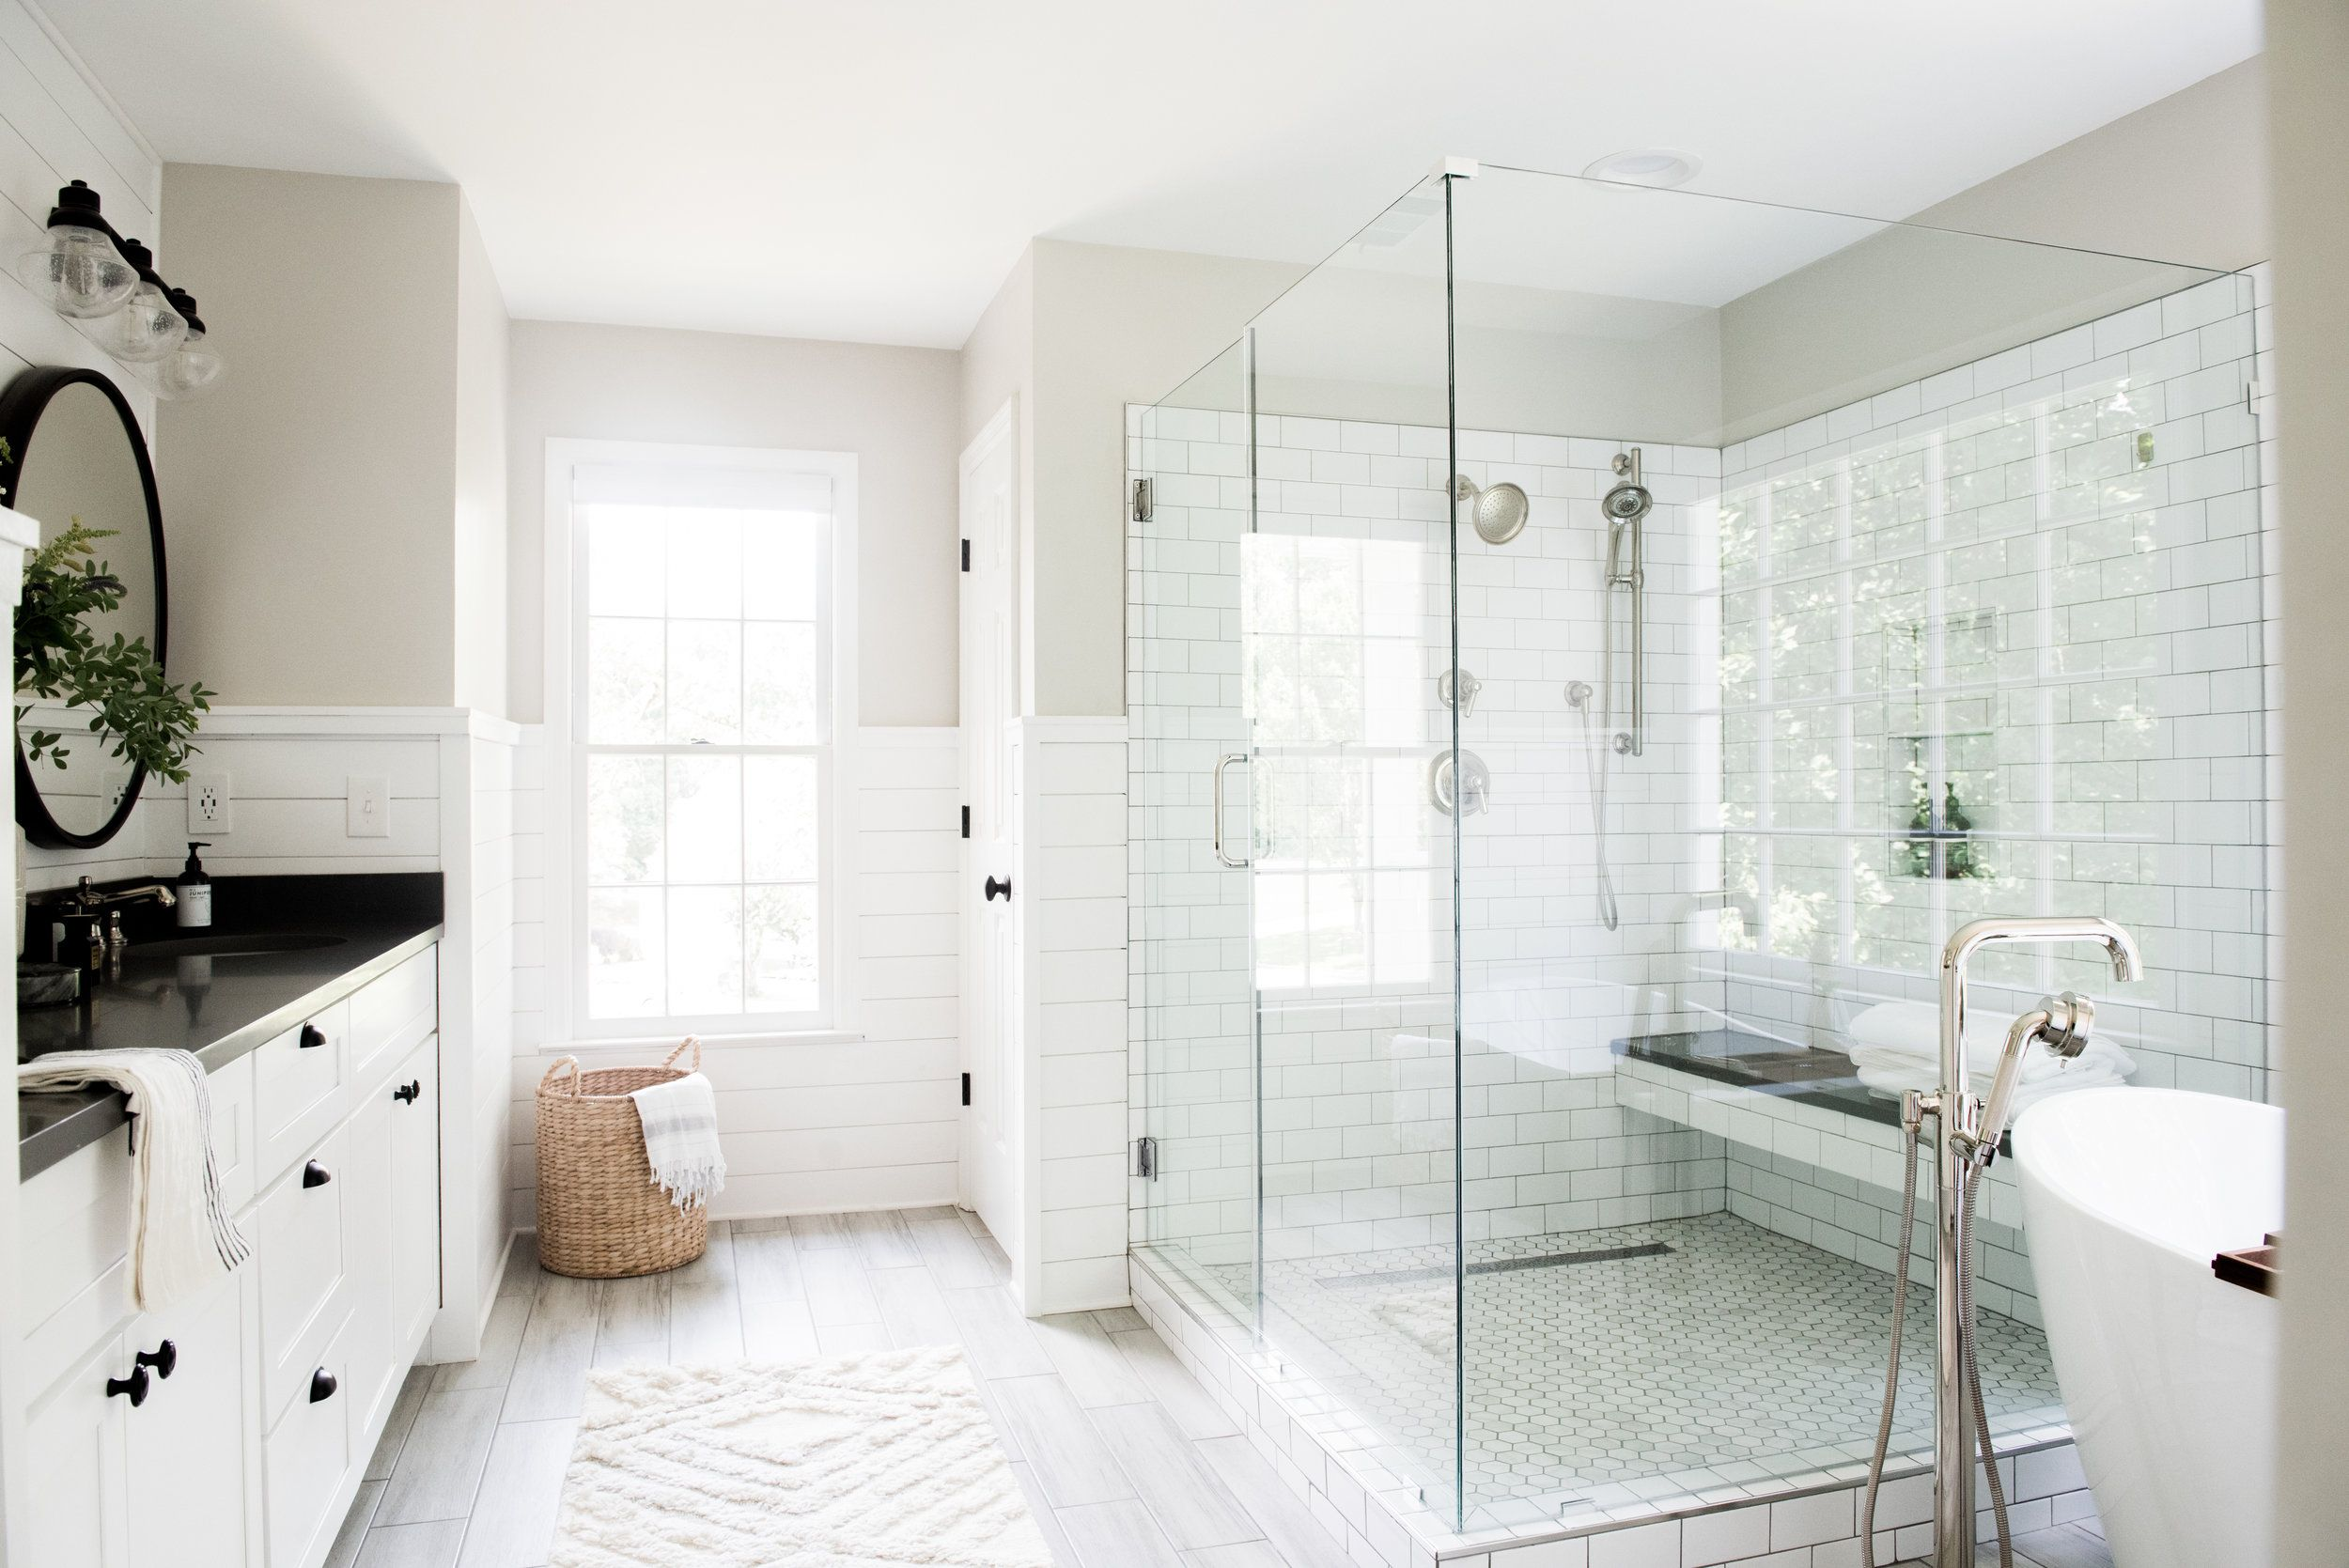 Modern Cozy Farmhouse Master Bathroom Renovation Styling On A